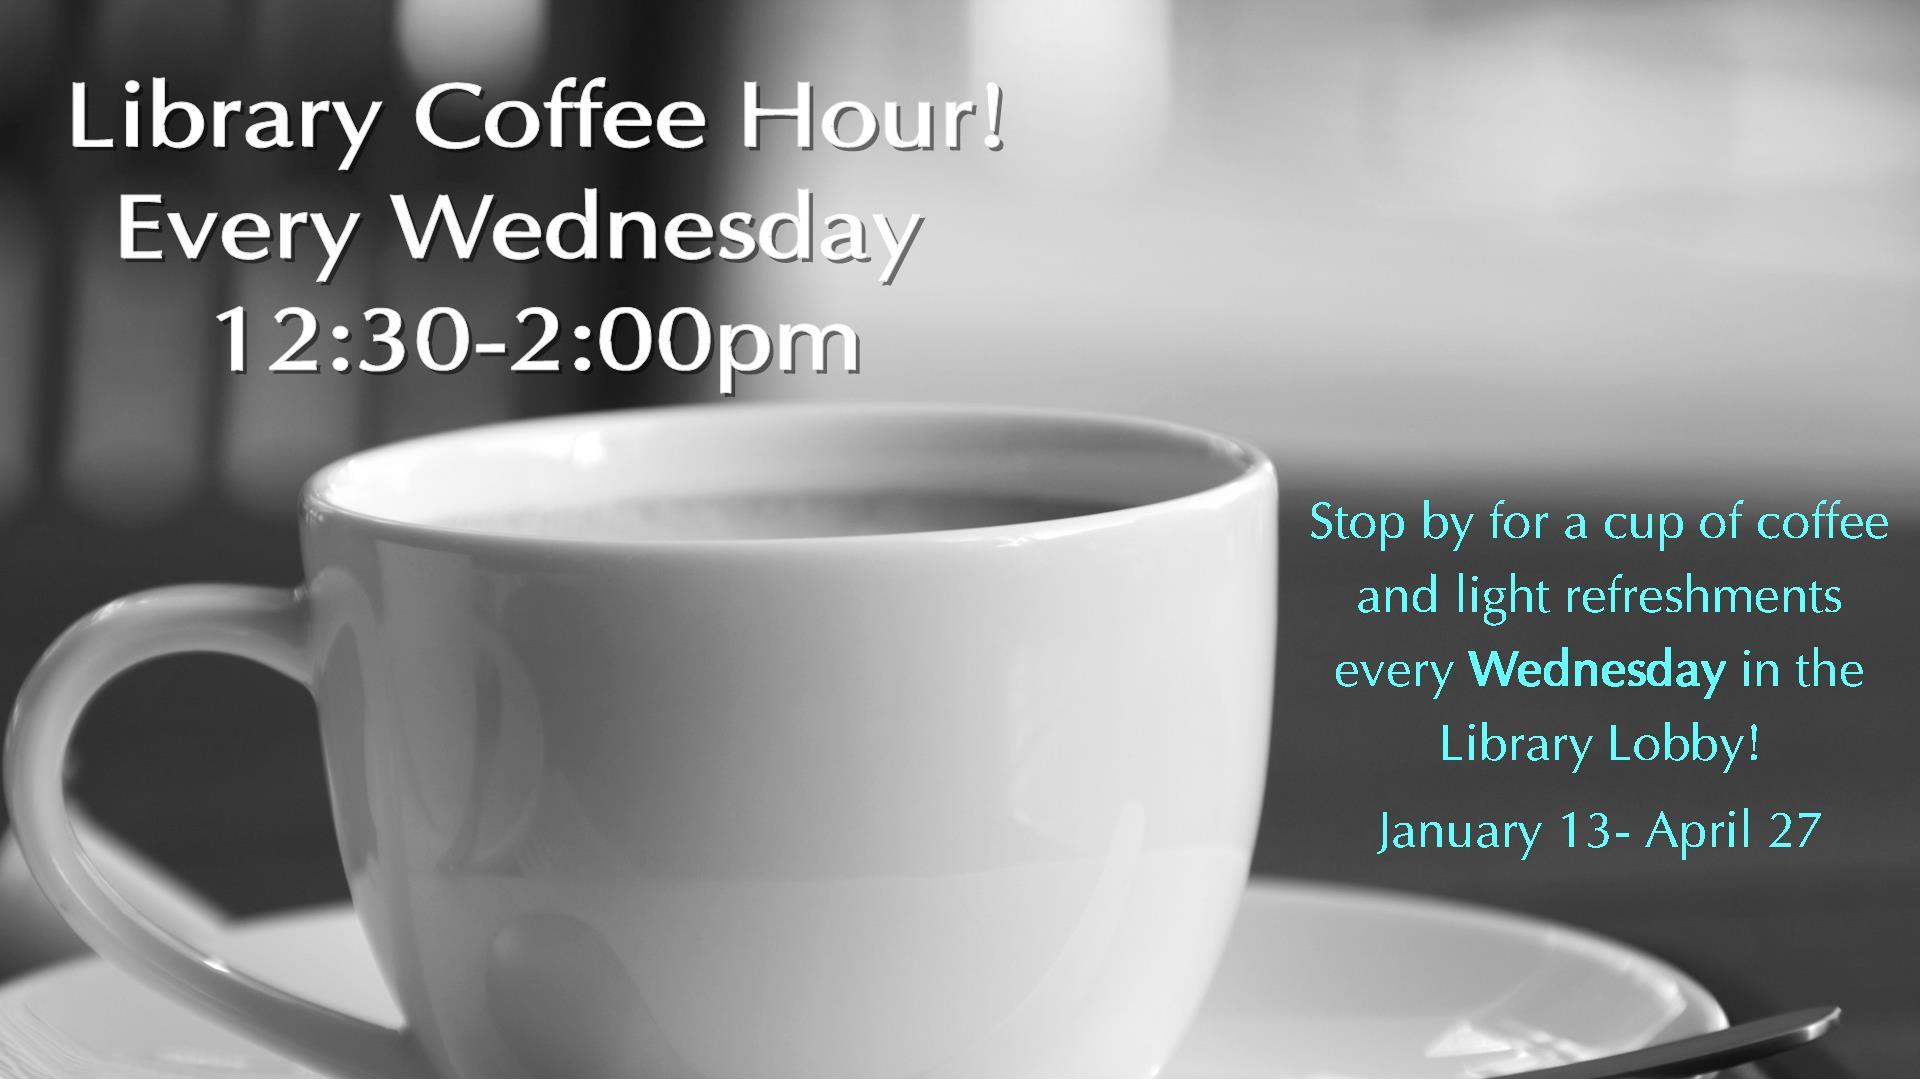 Spring 2016 Coffee Hour Digital Signage